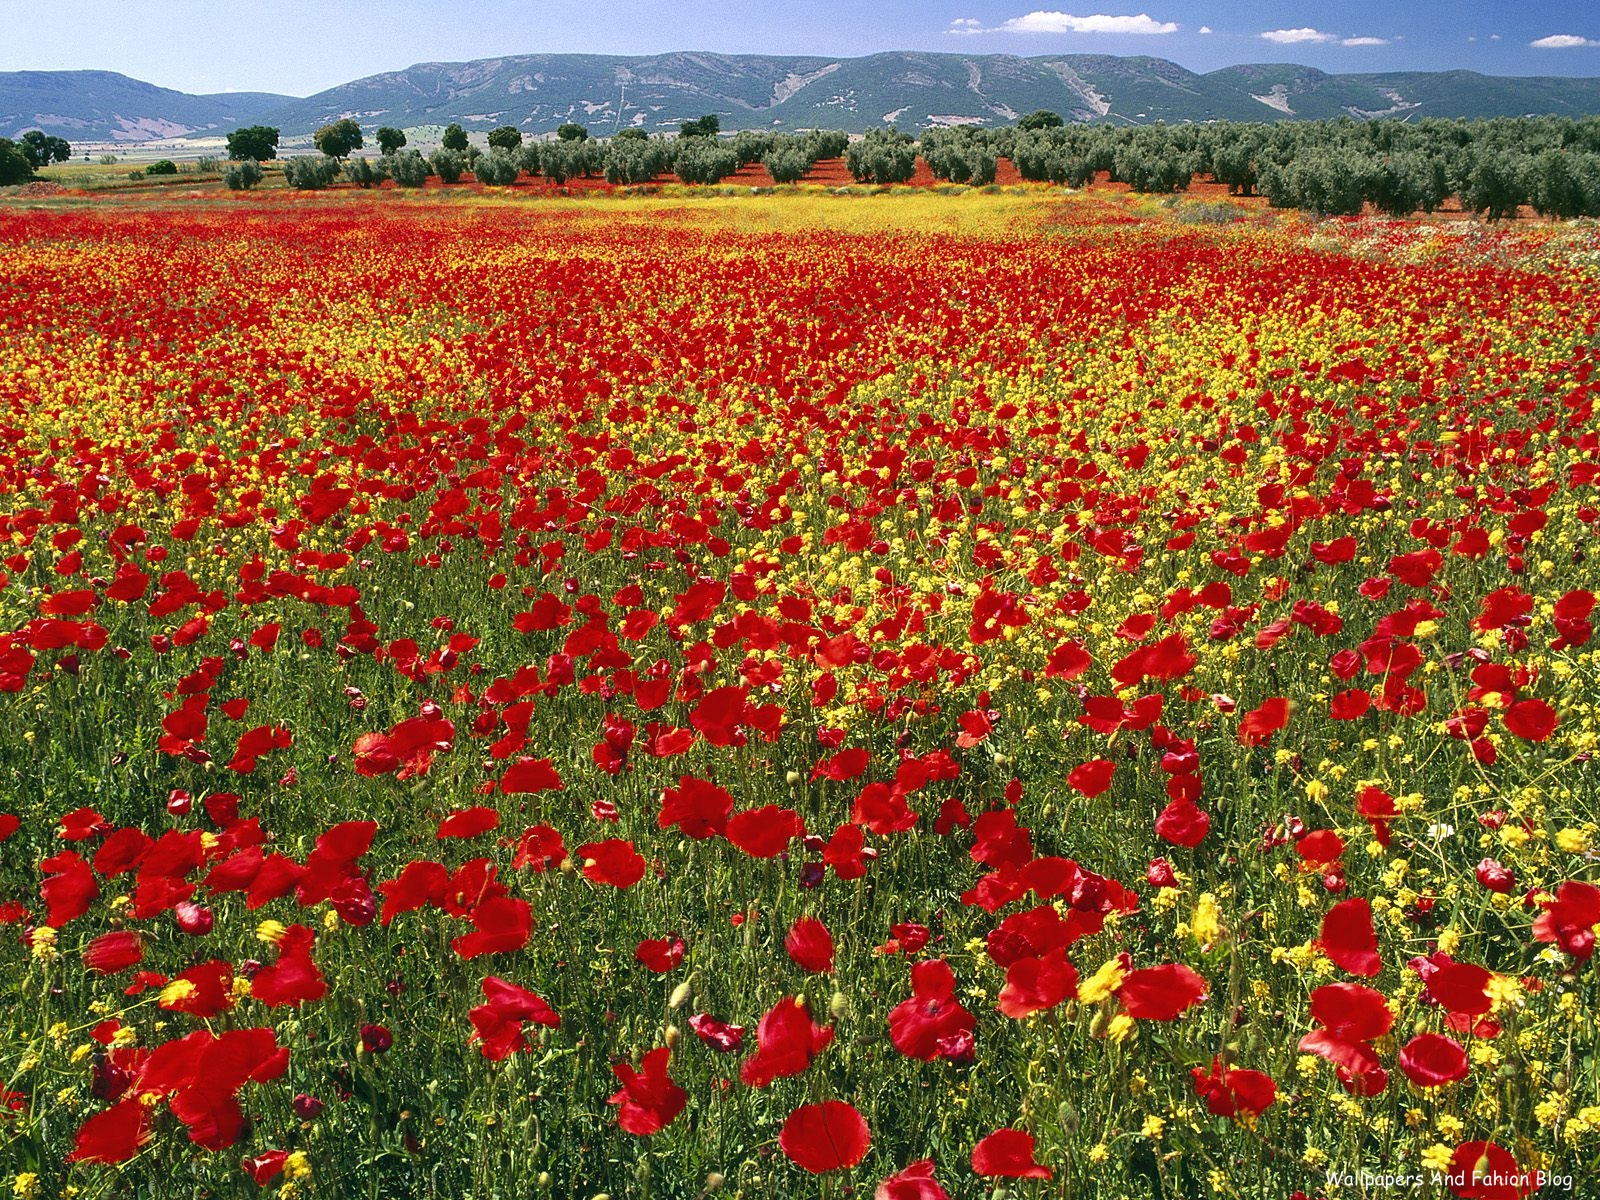 http://1.bp.blogspot.com/-QsyaBco3Sts/TpjTdrUWk8I/AAAAAAAACqQ/Hf9M9pNAYZs/s1600/Endless+Poppies%252C+Spain.jpg